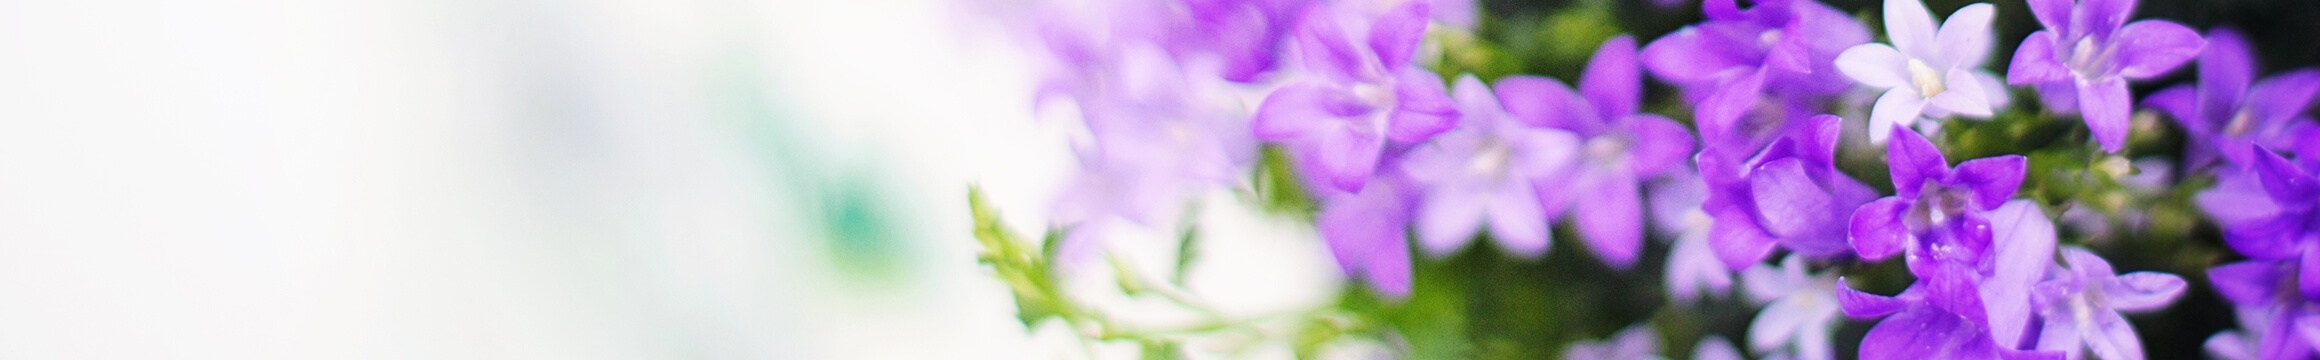 Floral 22